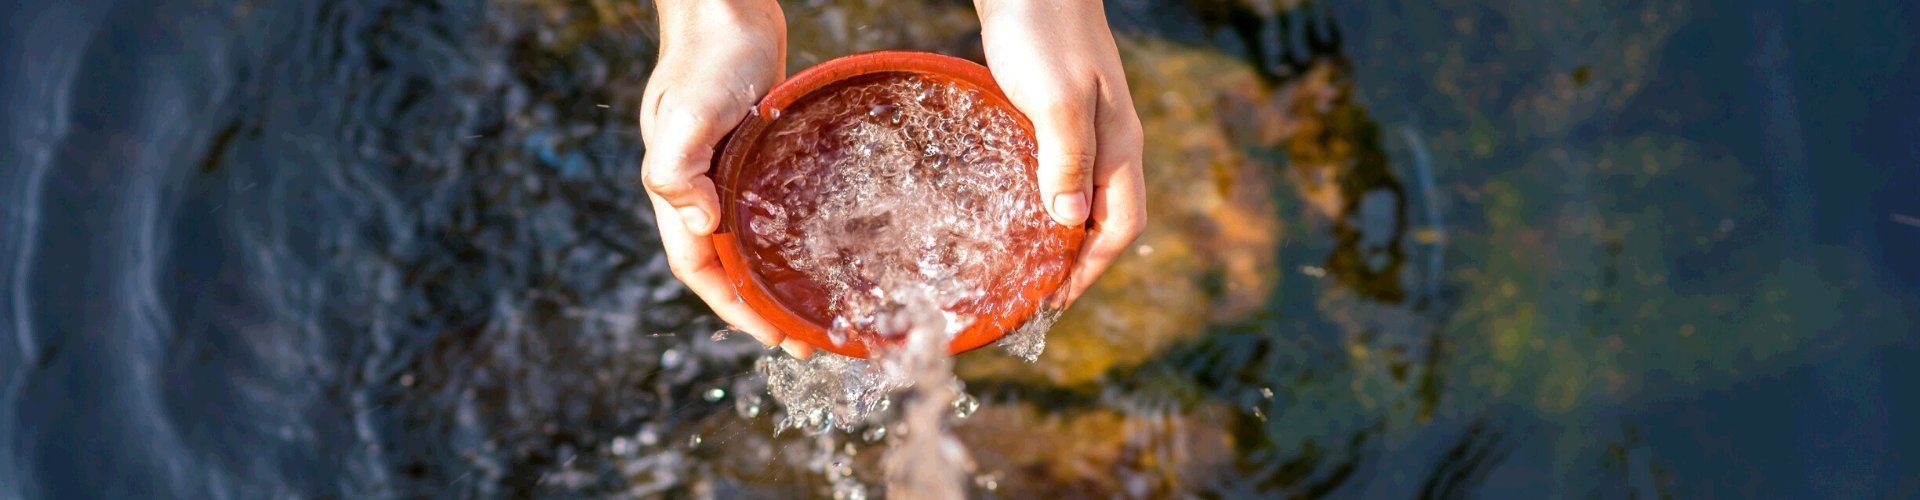 Sterilisateur-uv-eau-top